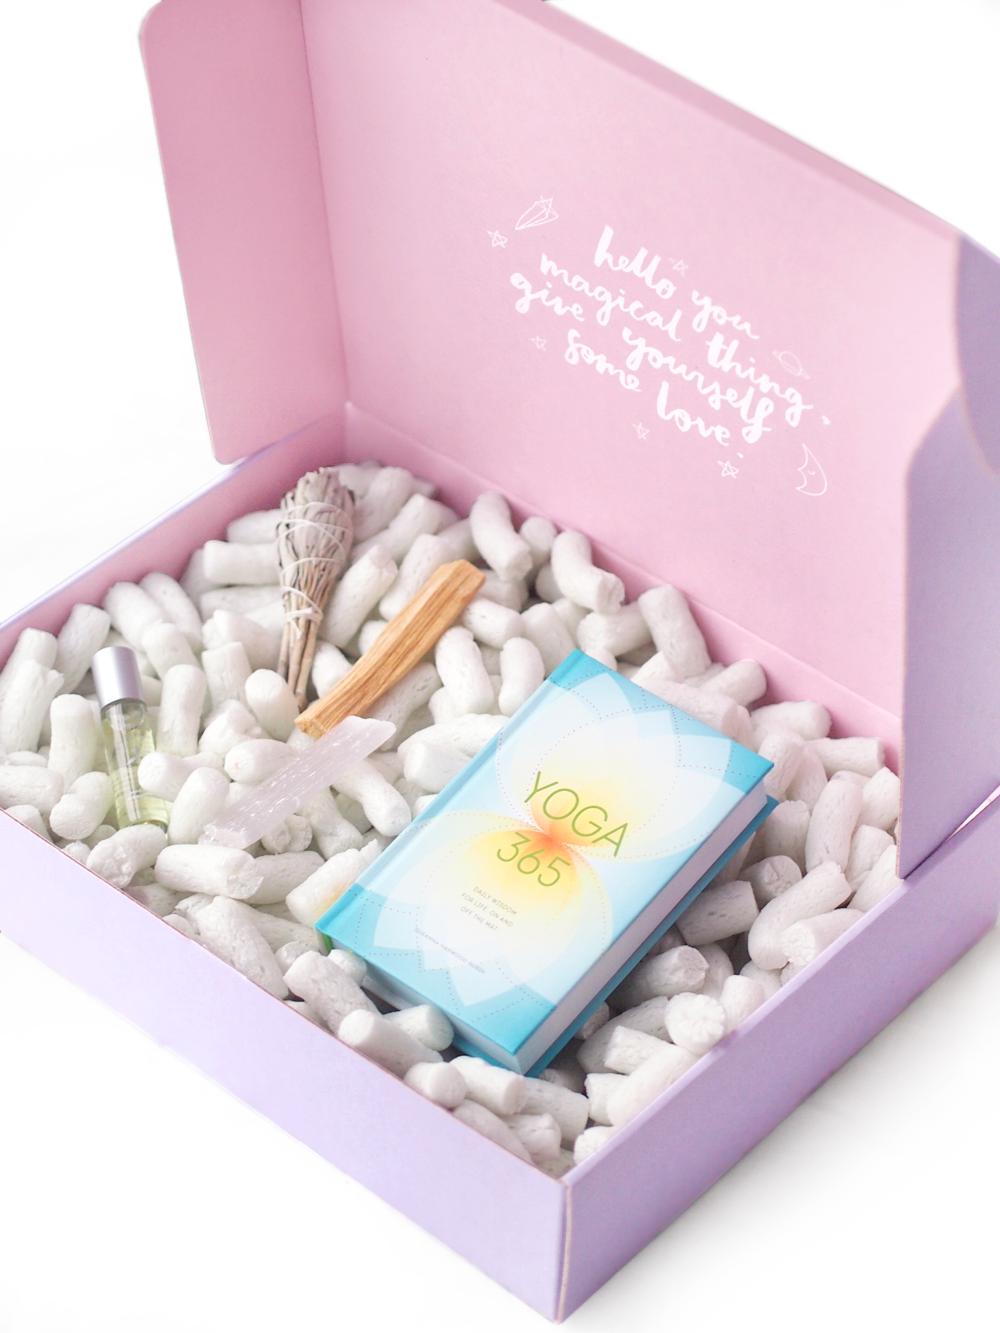 urban yogi self care box 1 copy.png